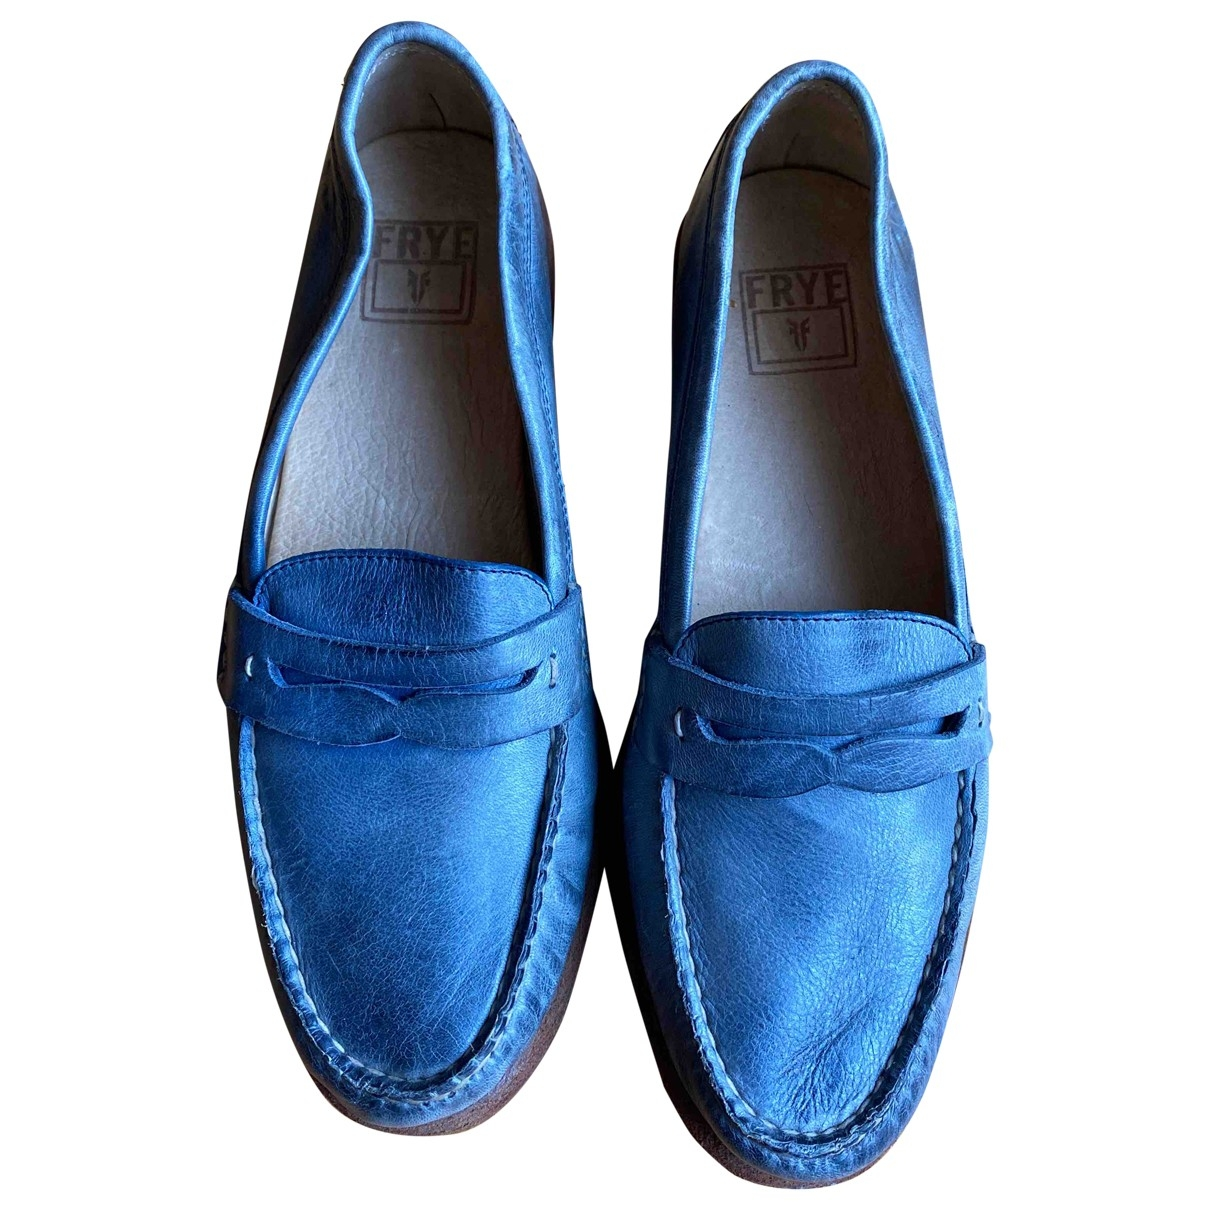 Frye \N Blue Leather Flats for Women 36 EU